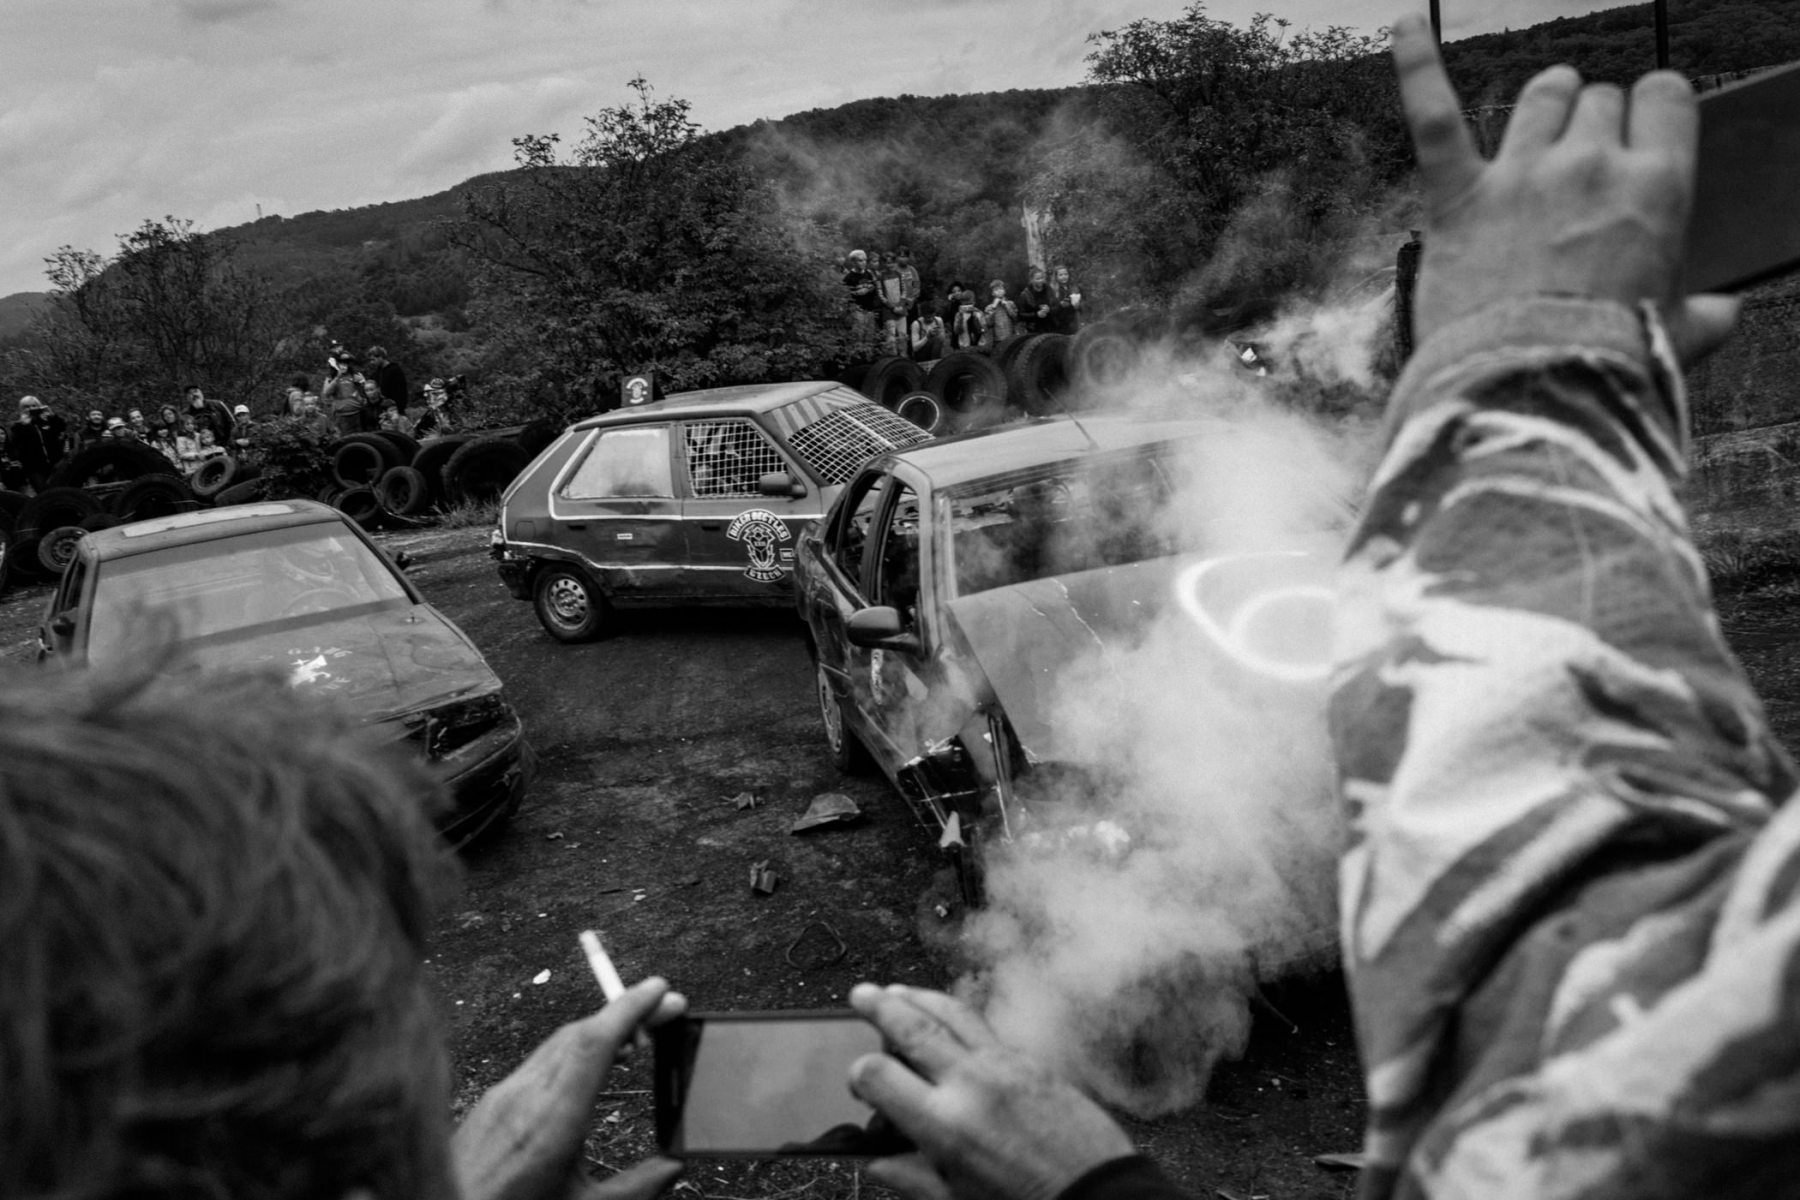 kevin_v_ton_Crash-Cars_03